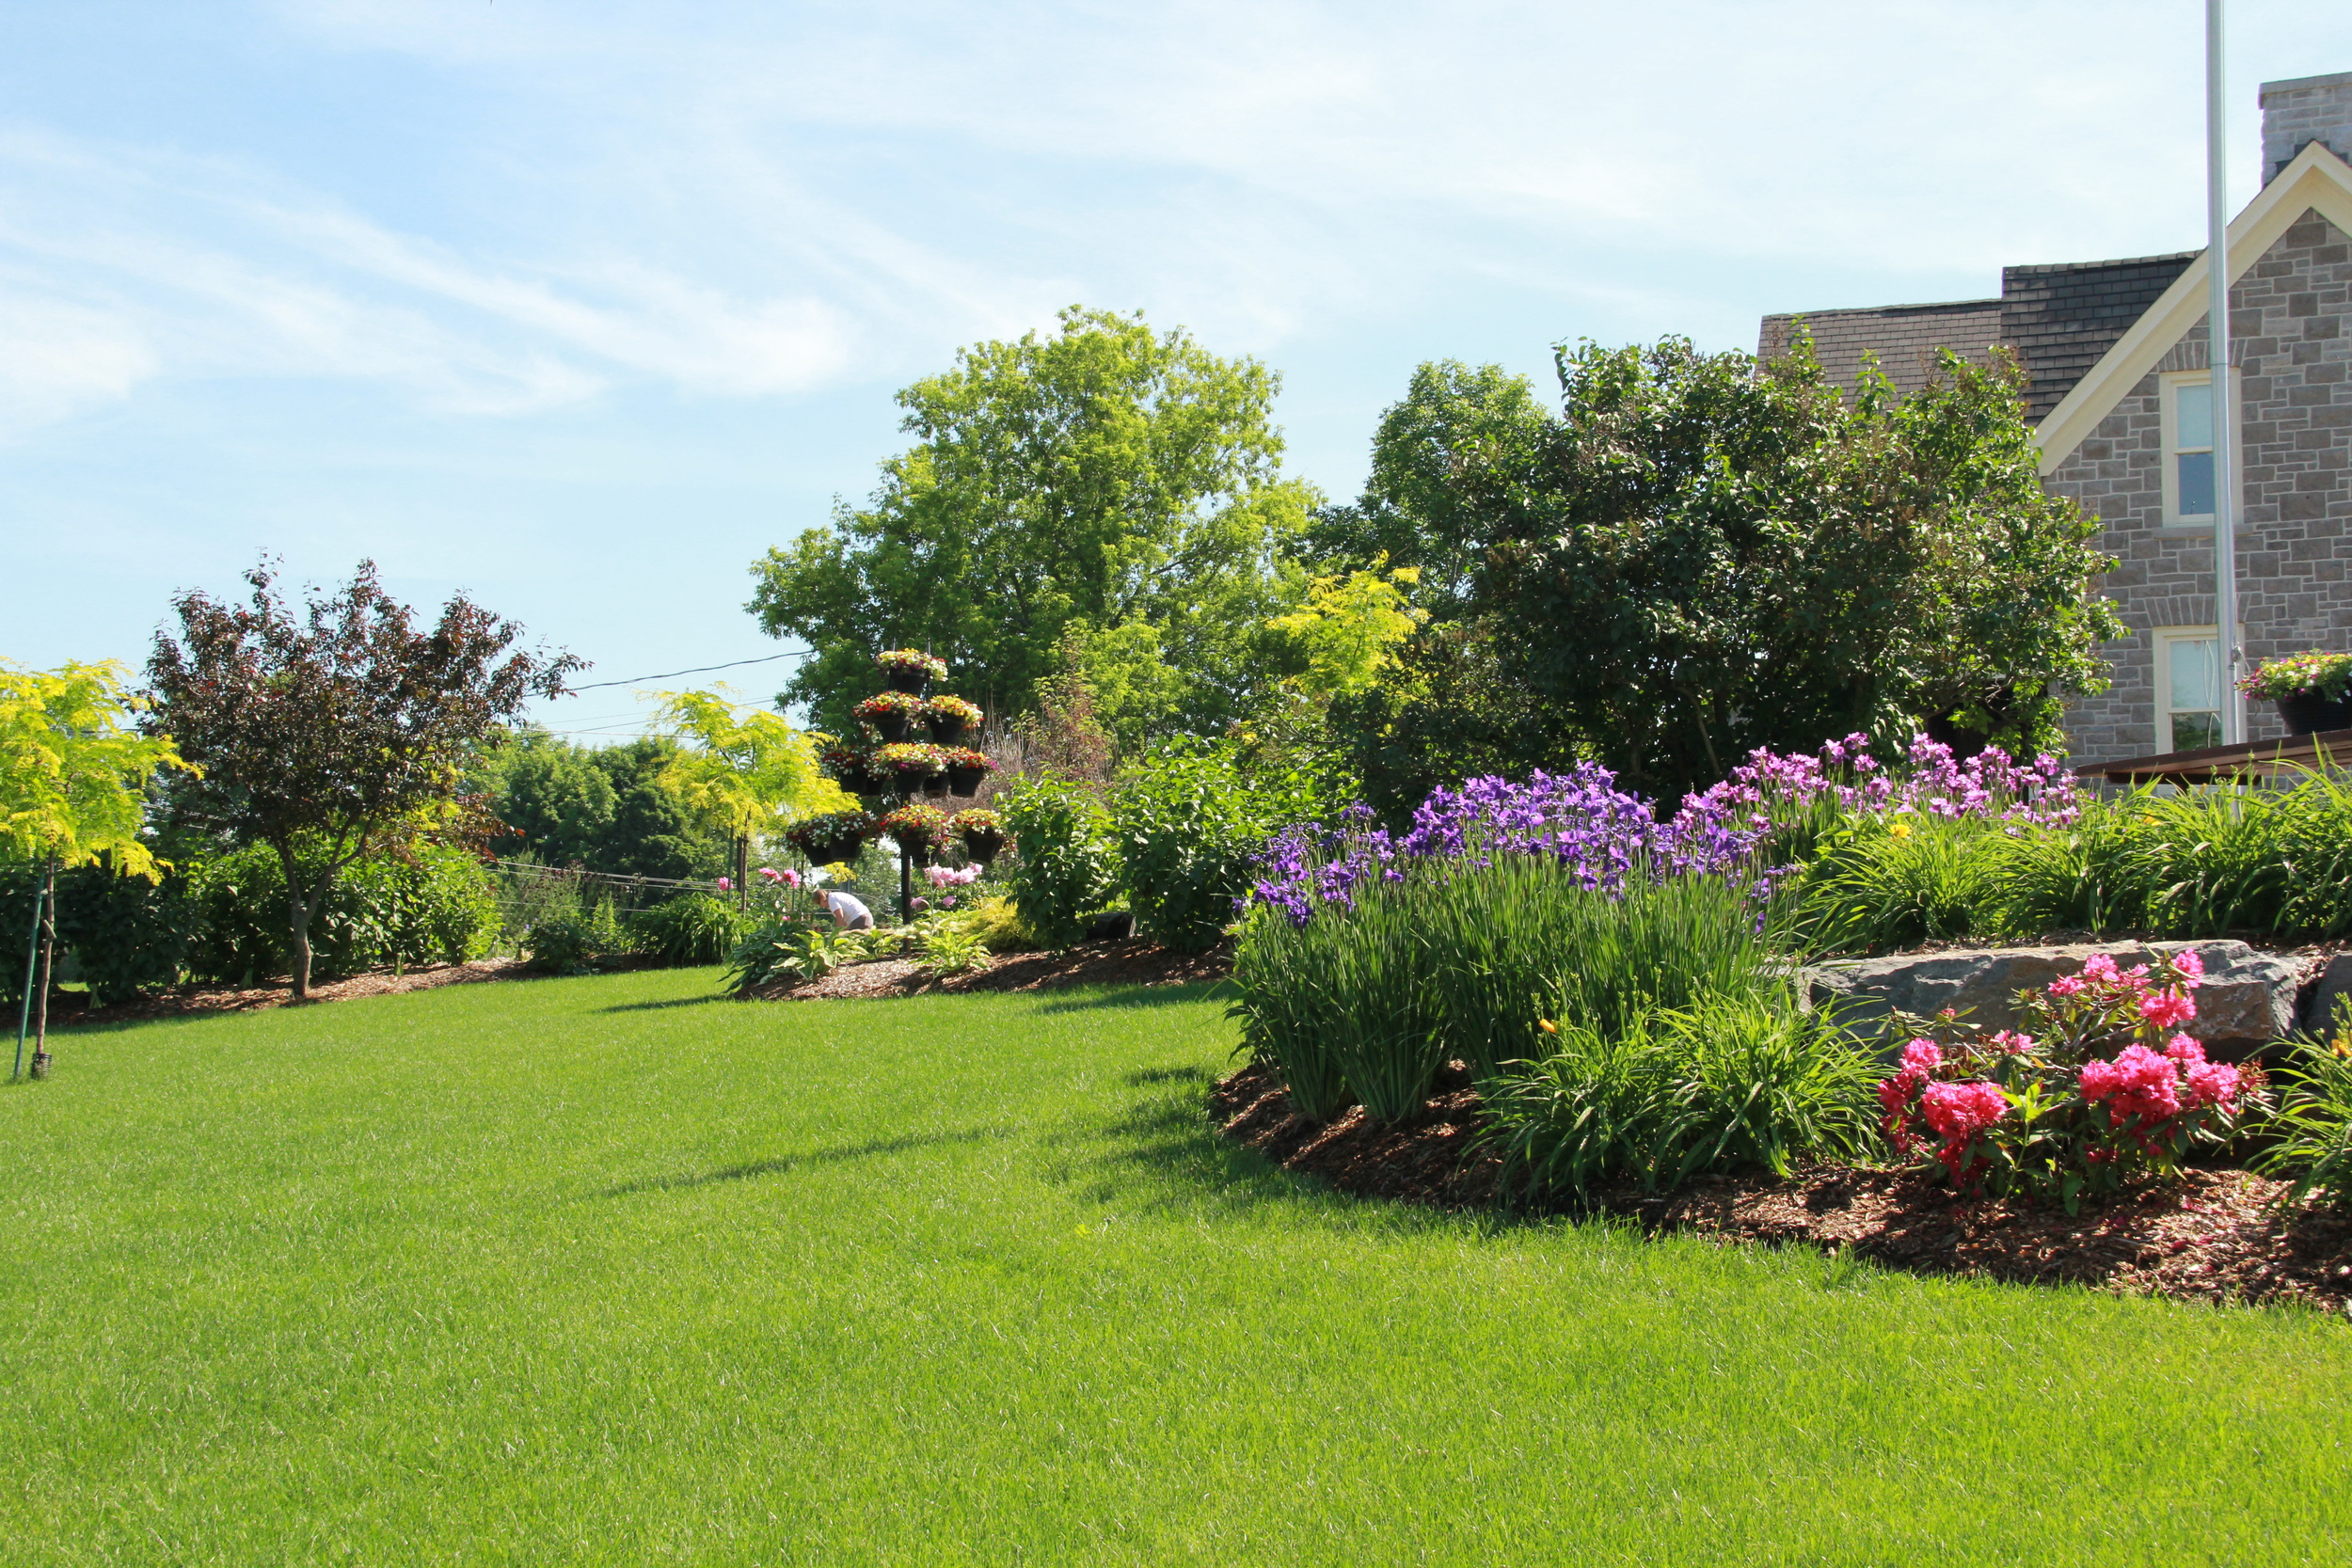 Country Home | Stone House | Flower Garden | Landscape Design | Landscaping | Riverview Design Solutions | Prescott, Ontario, Canada3